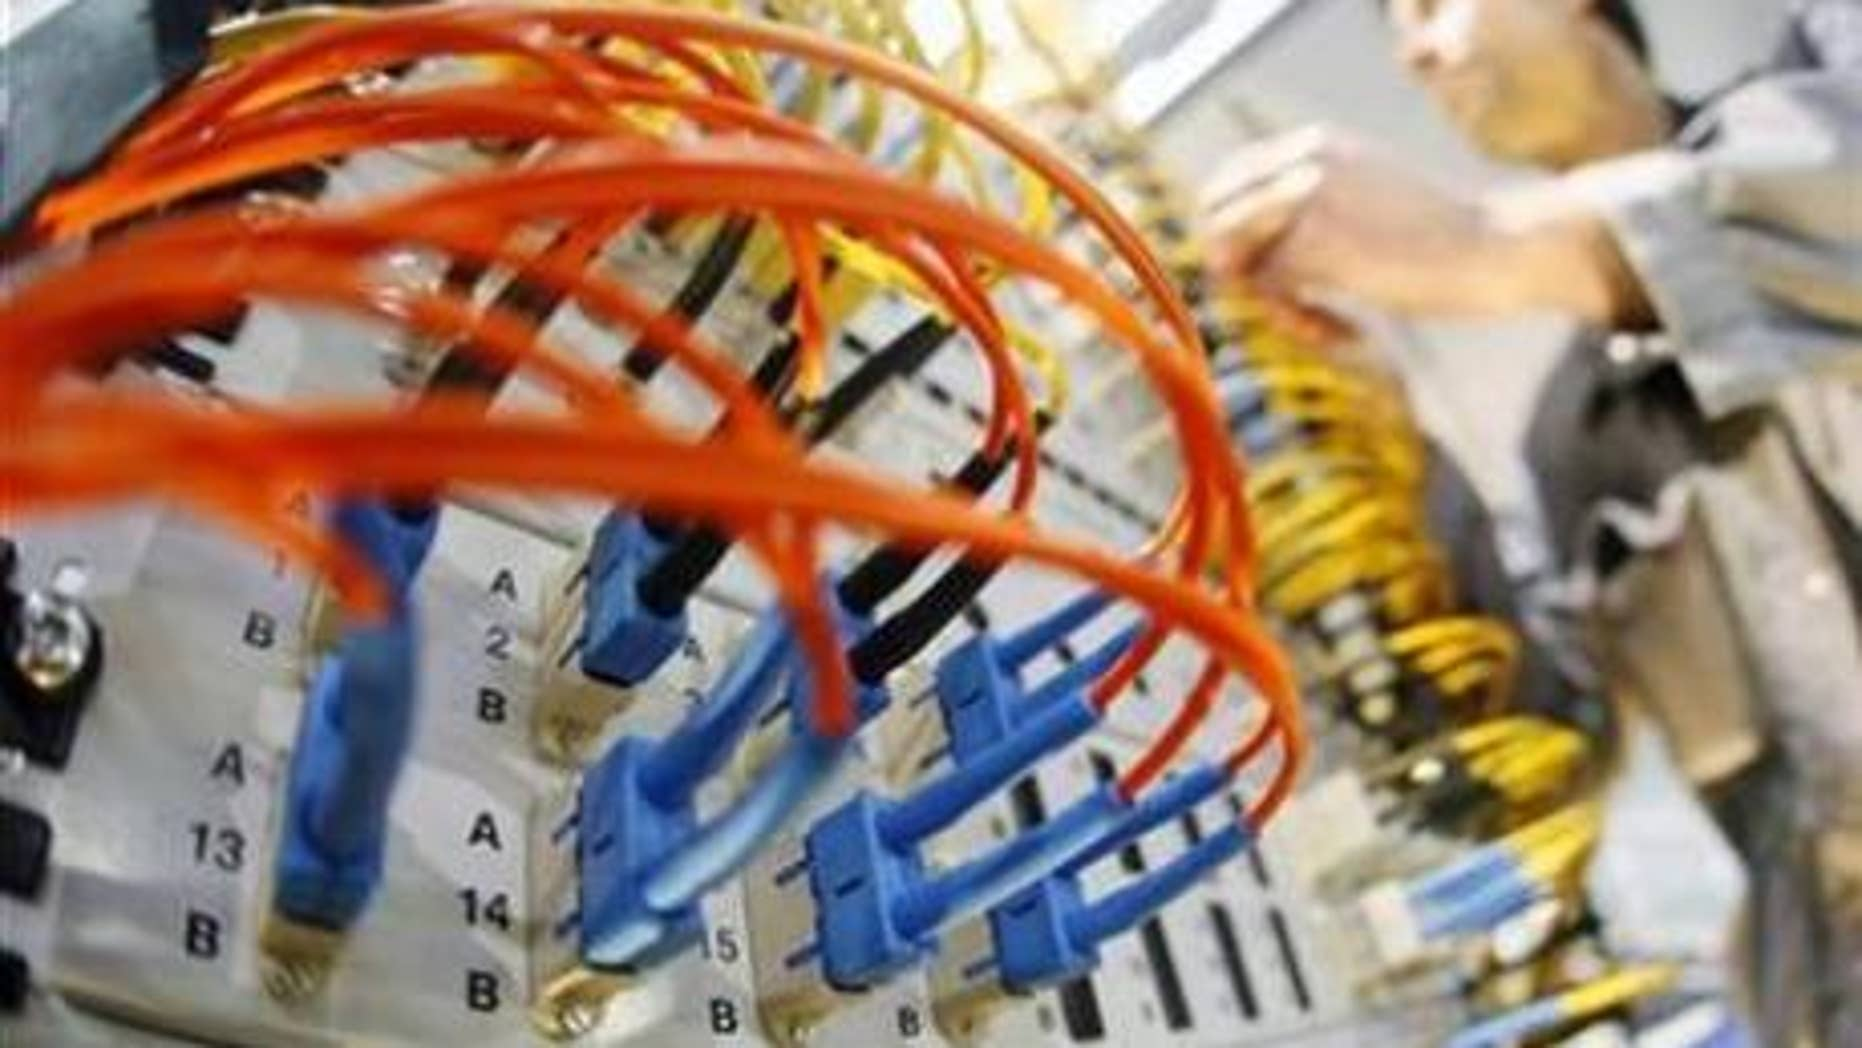 A worker prepares a server in a file photo.